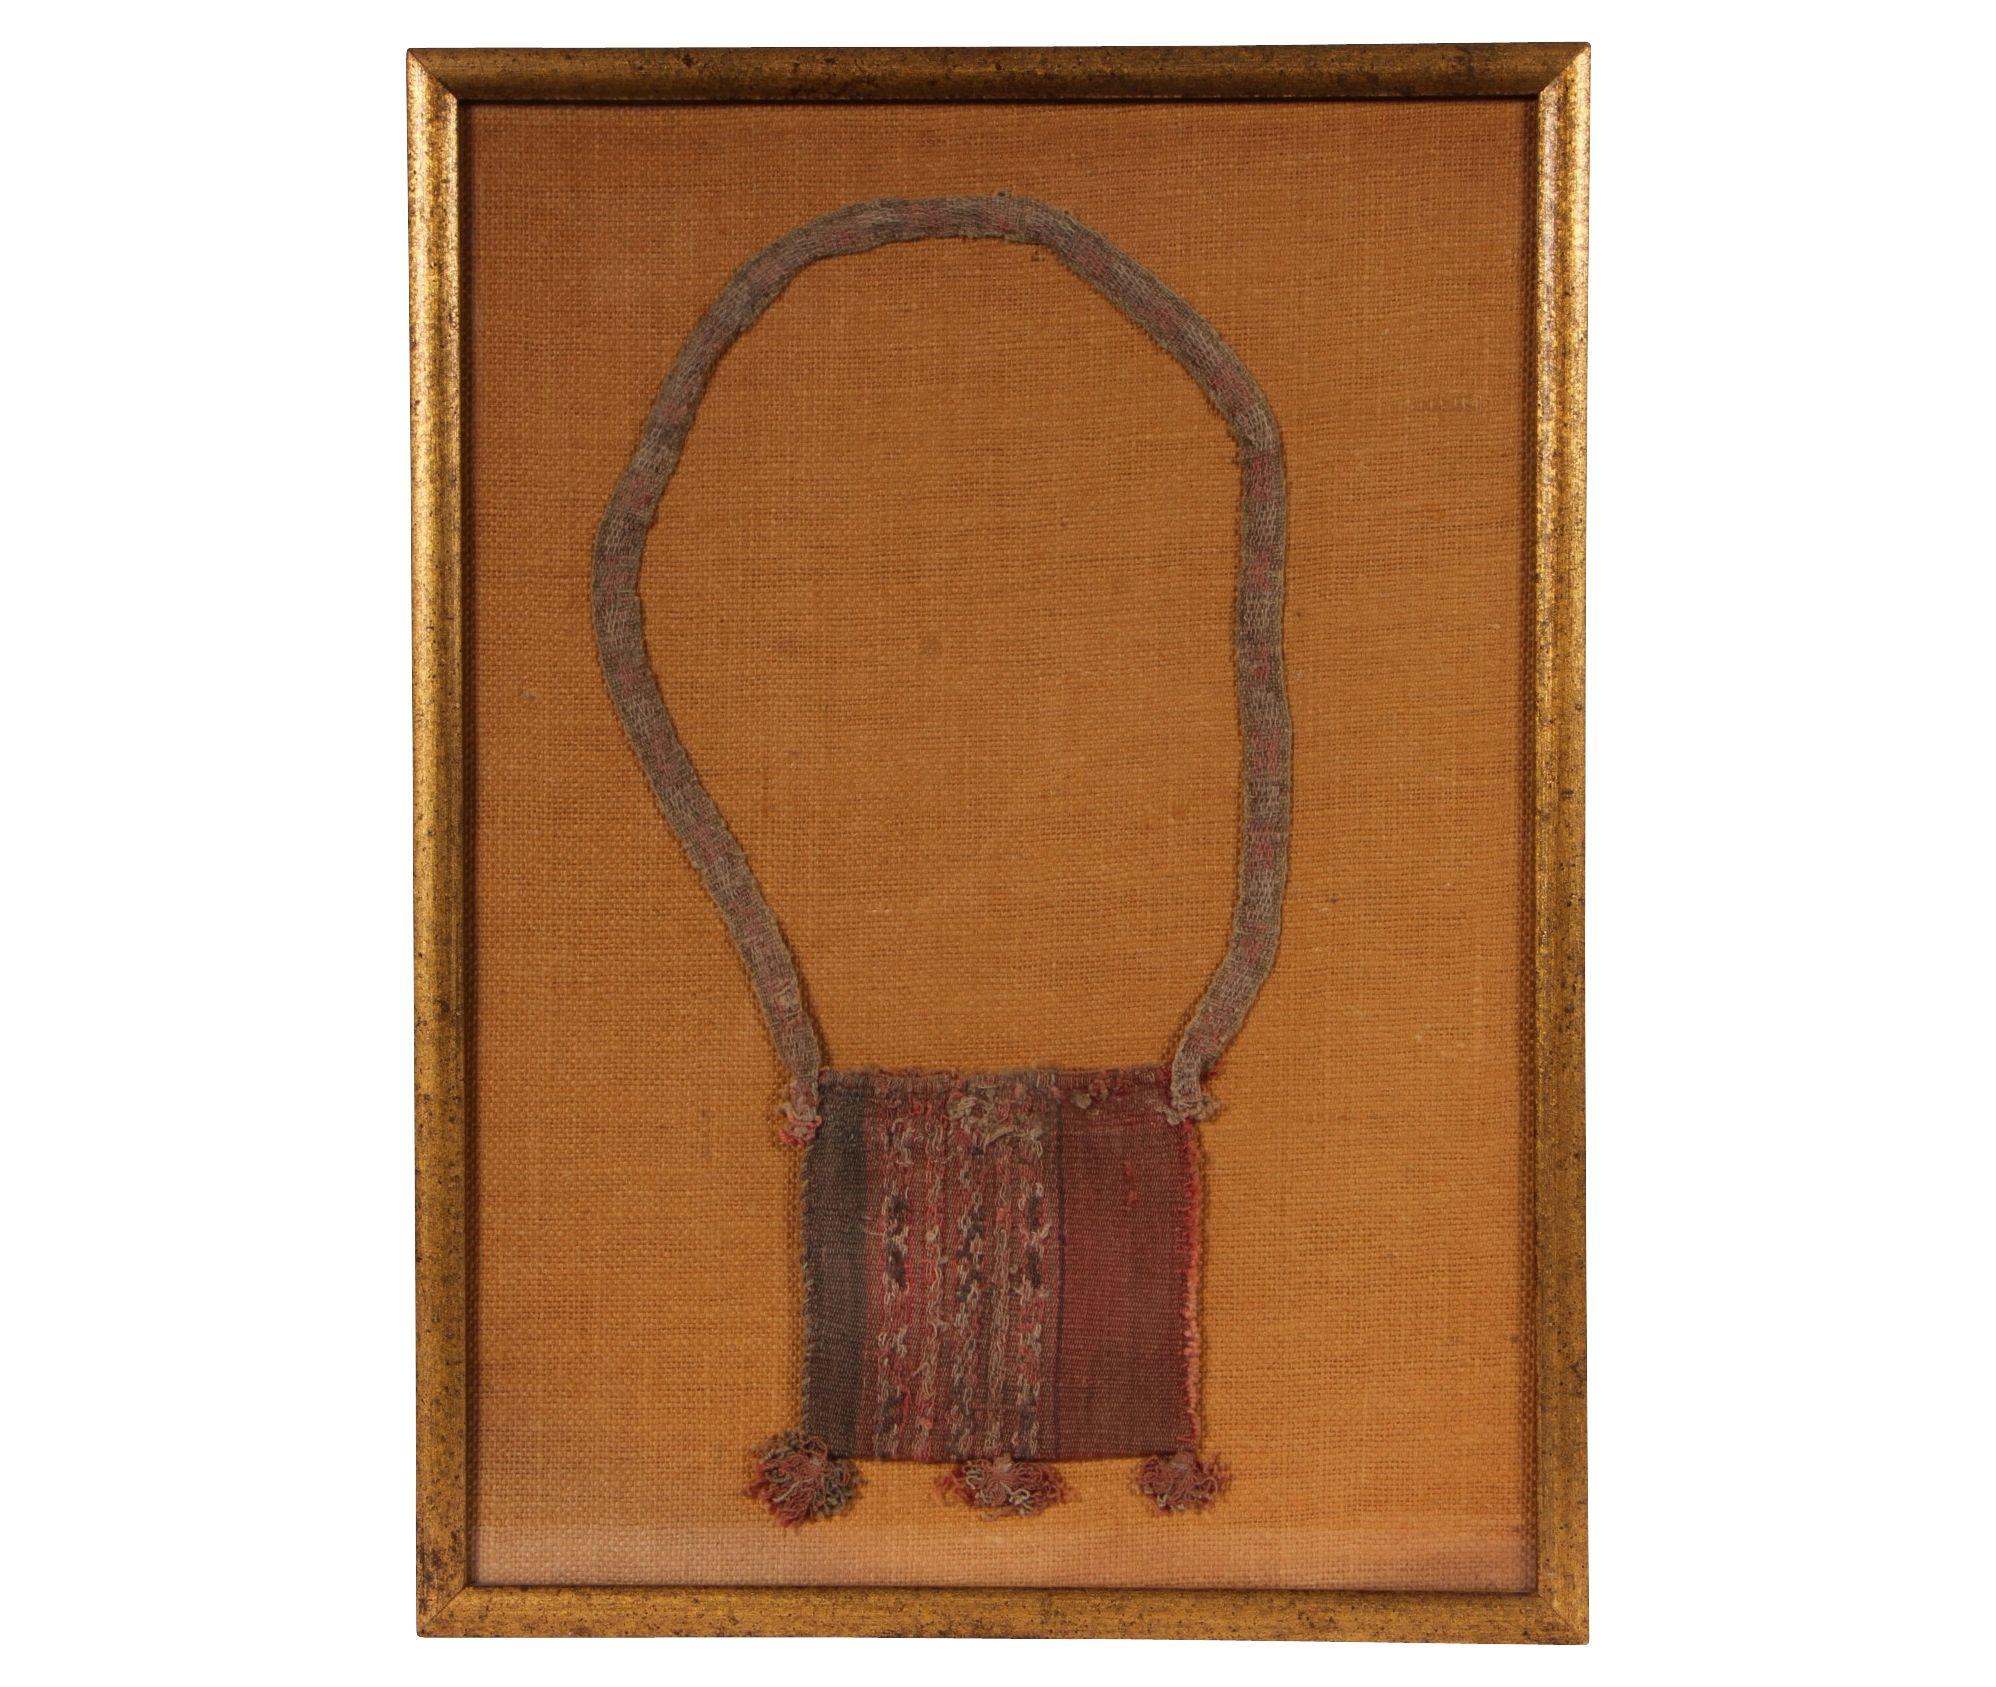 FRAMED PERUVIAN WOVEN COCA BEAN BAG Item #: 41255 $375.00